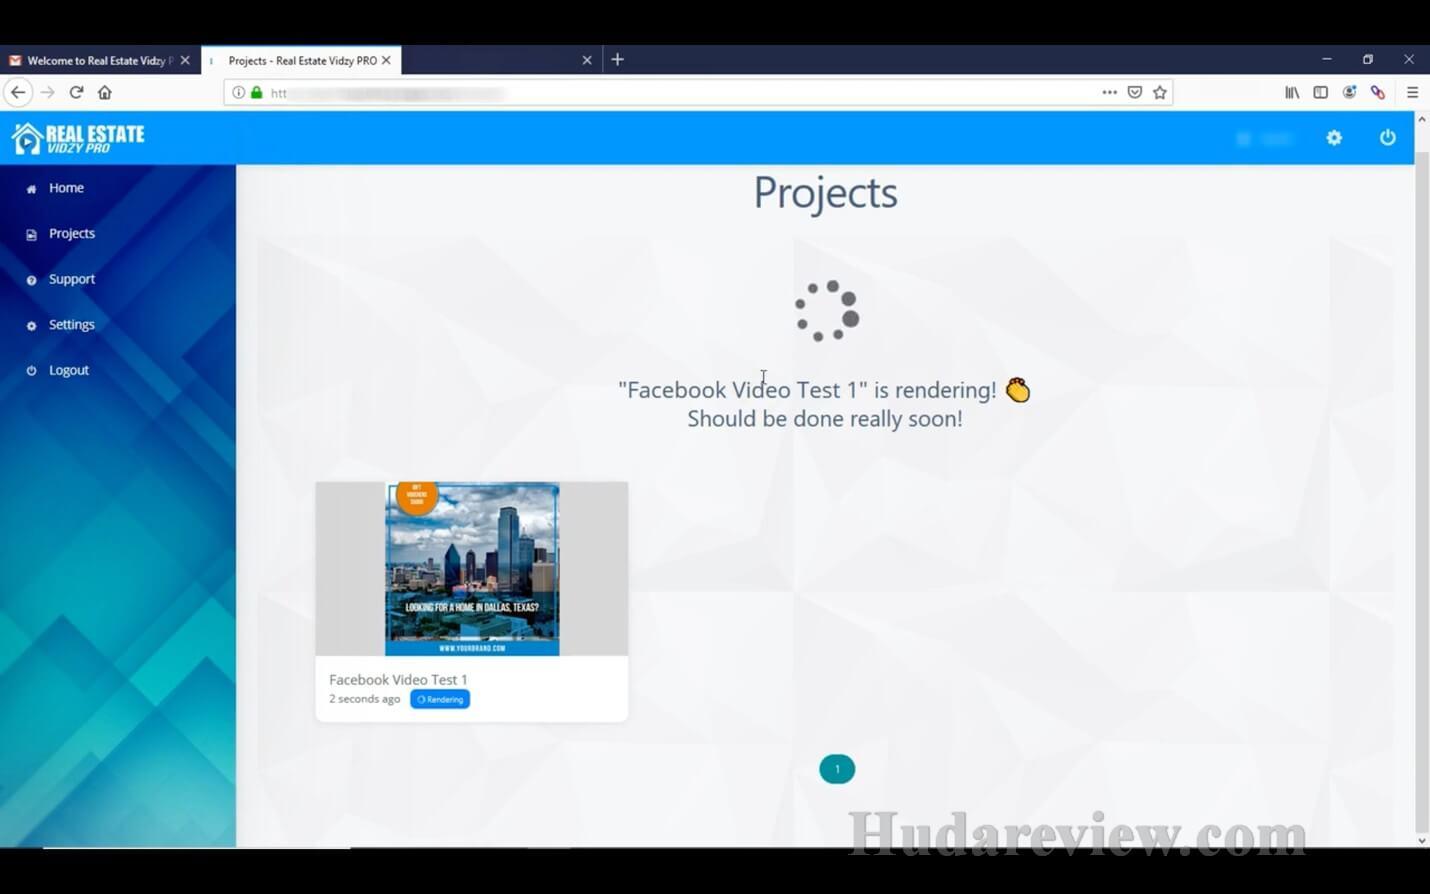 Real-Estate-Vidzy-Pro-Review-Step-4